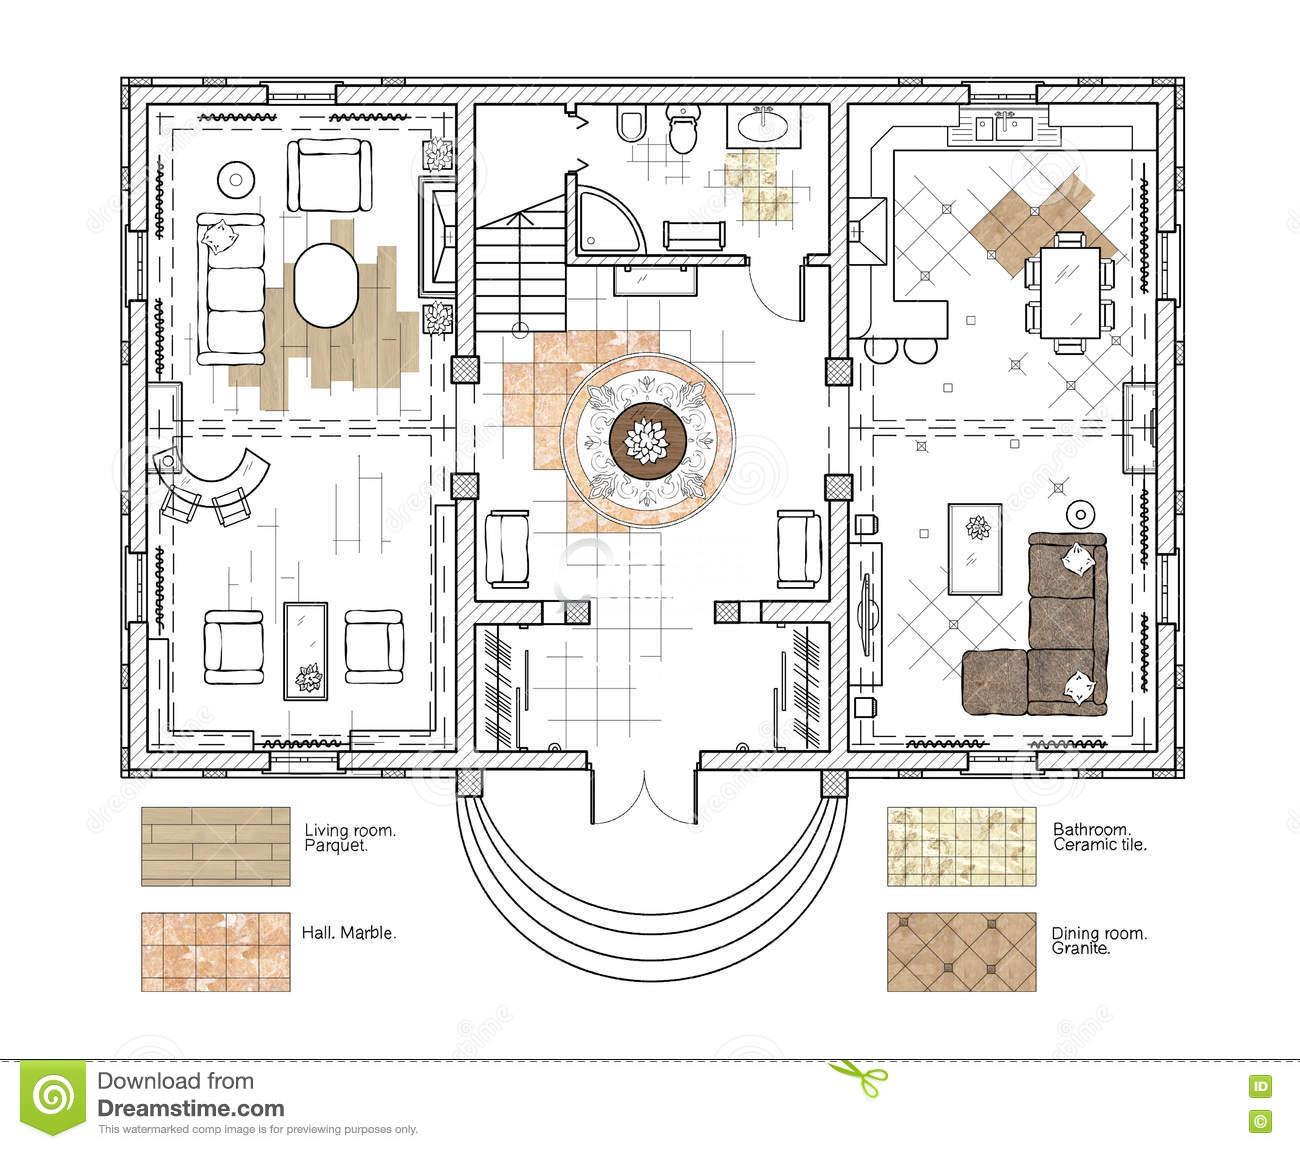 medium resolution of free lance autocad design and drafting in doha qatar